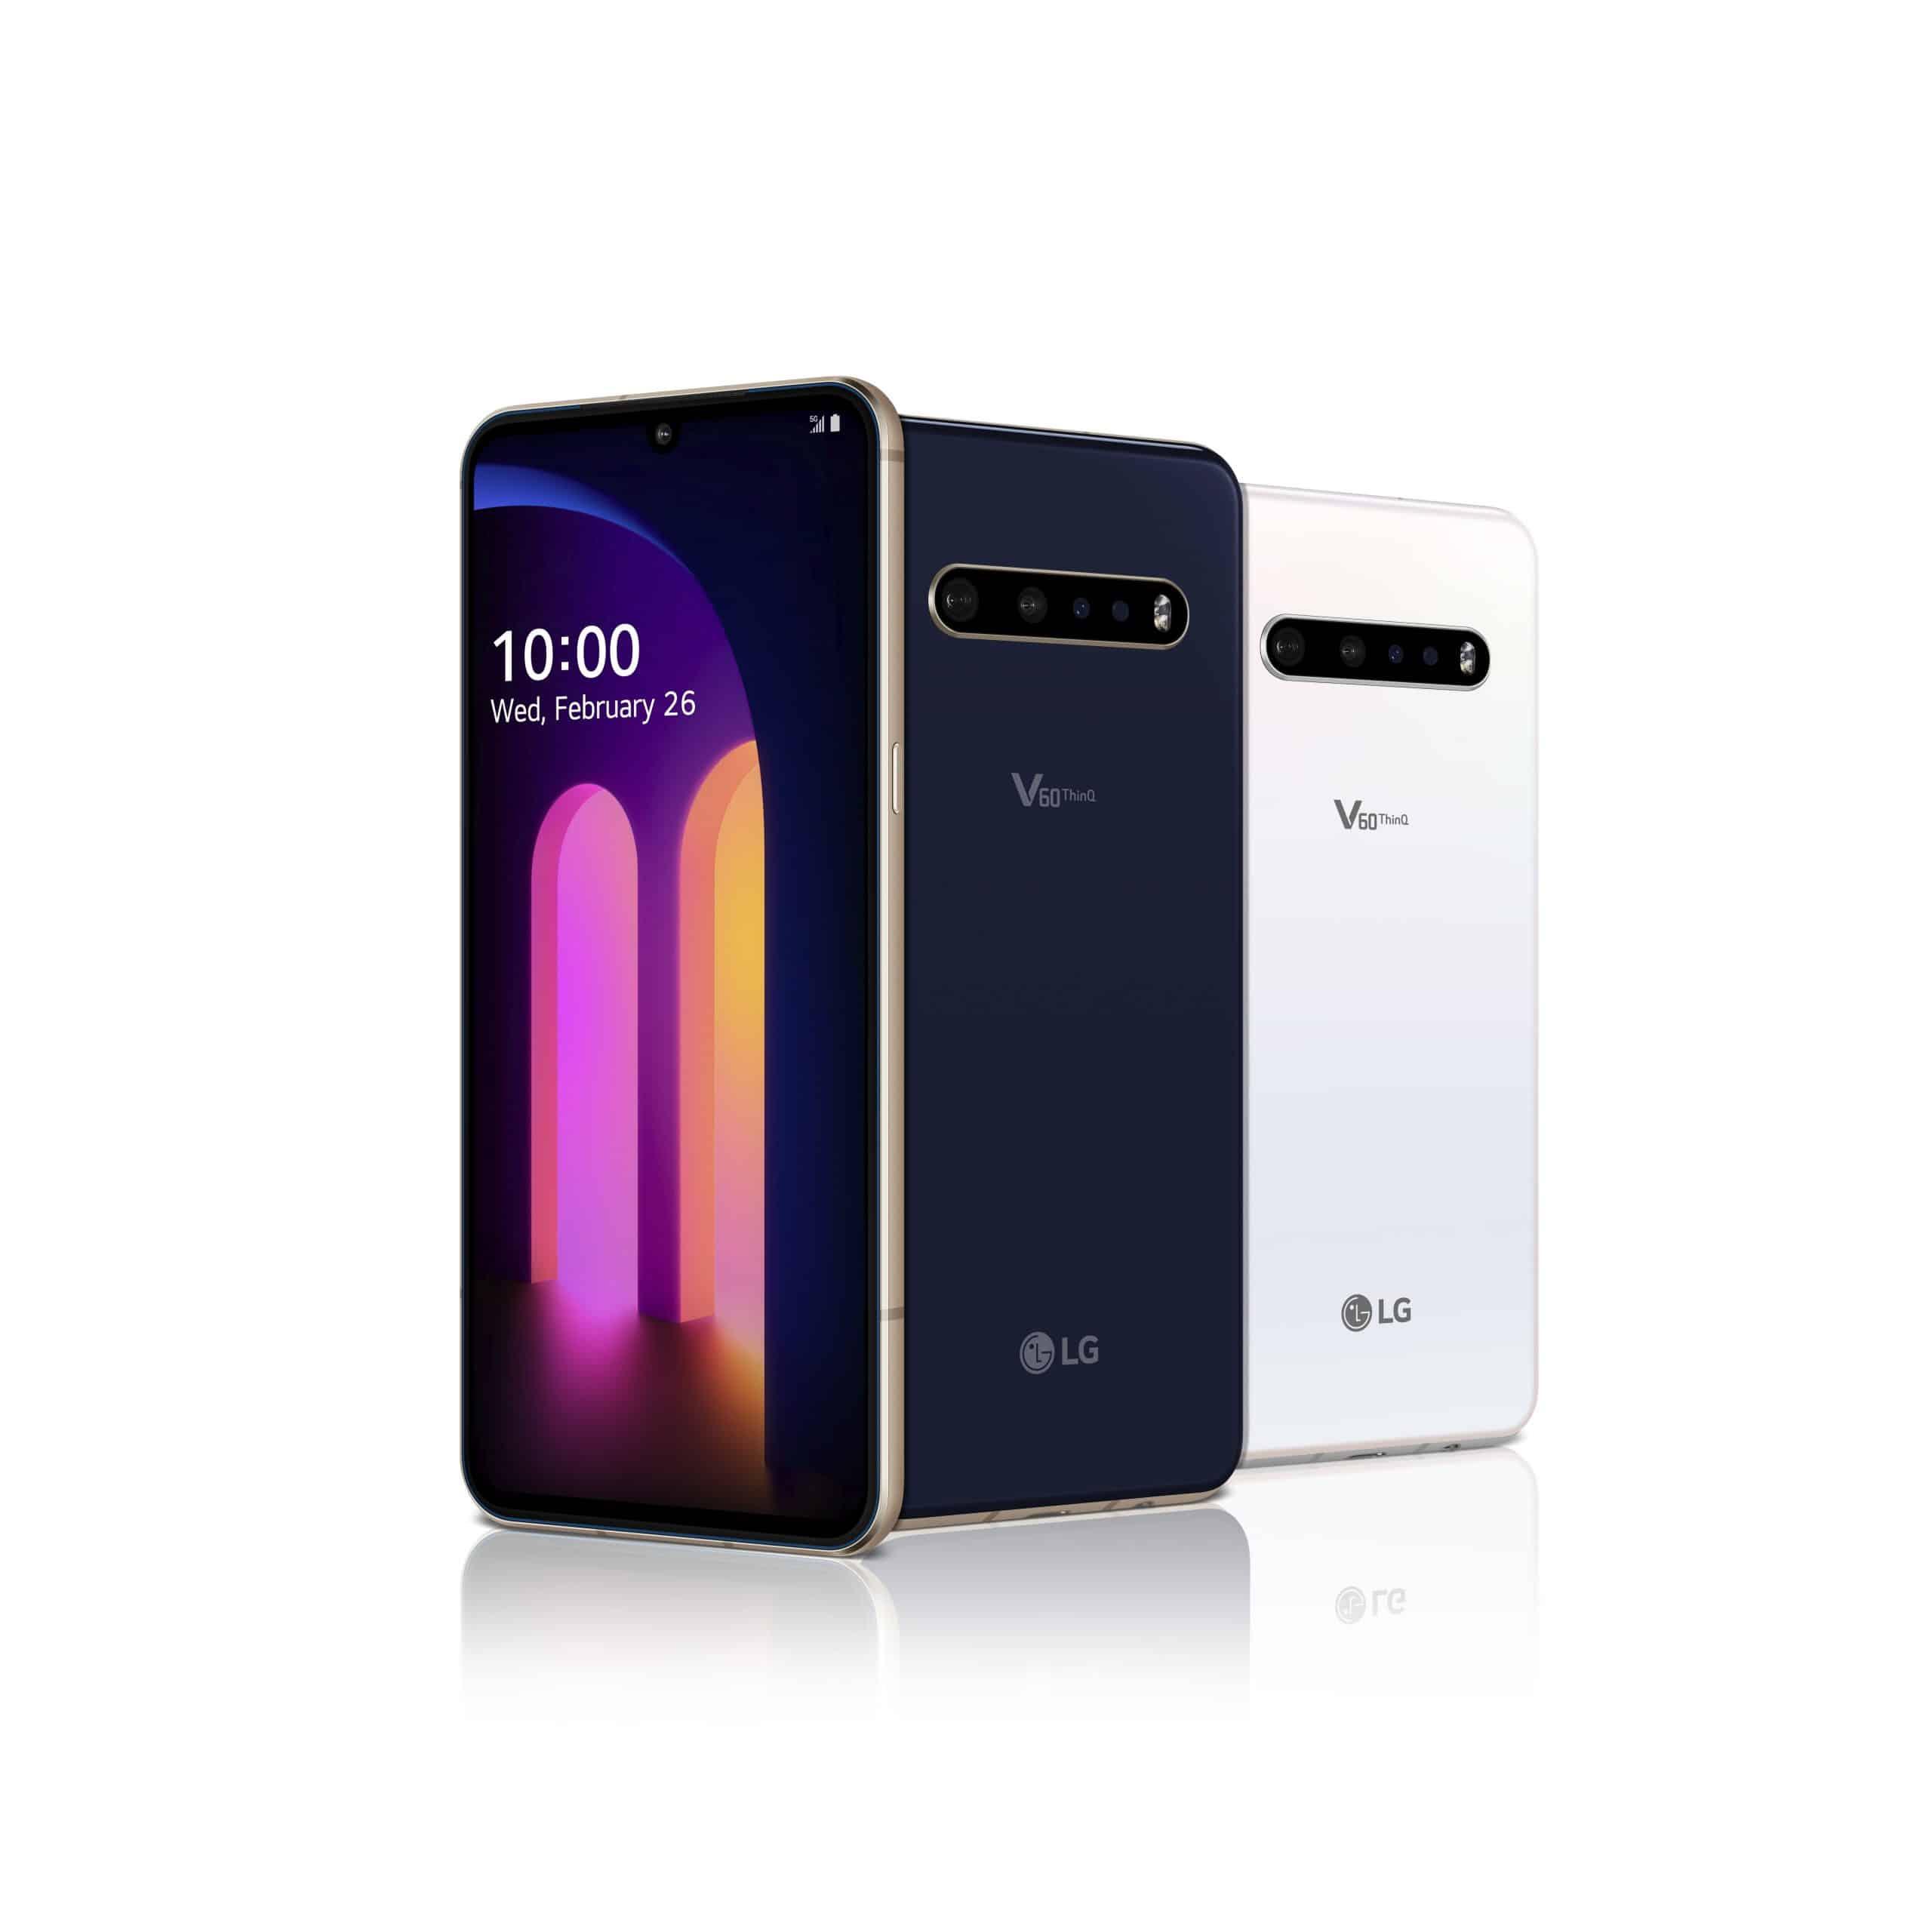 LG V60 ThinQ 5G with dual screen